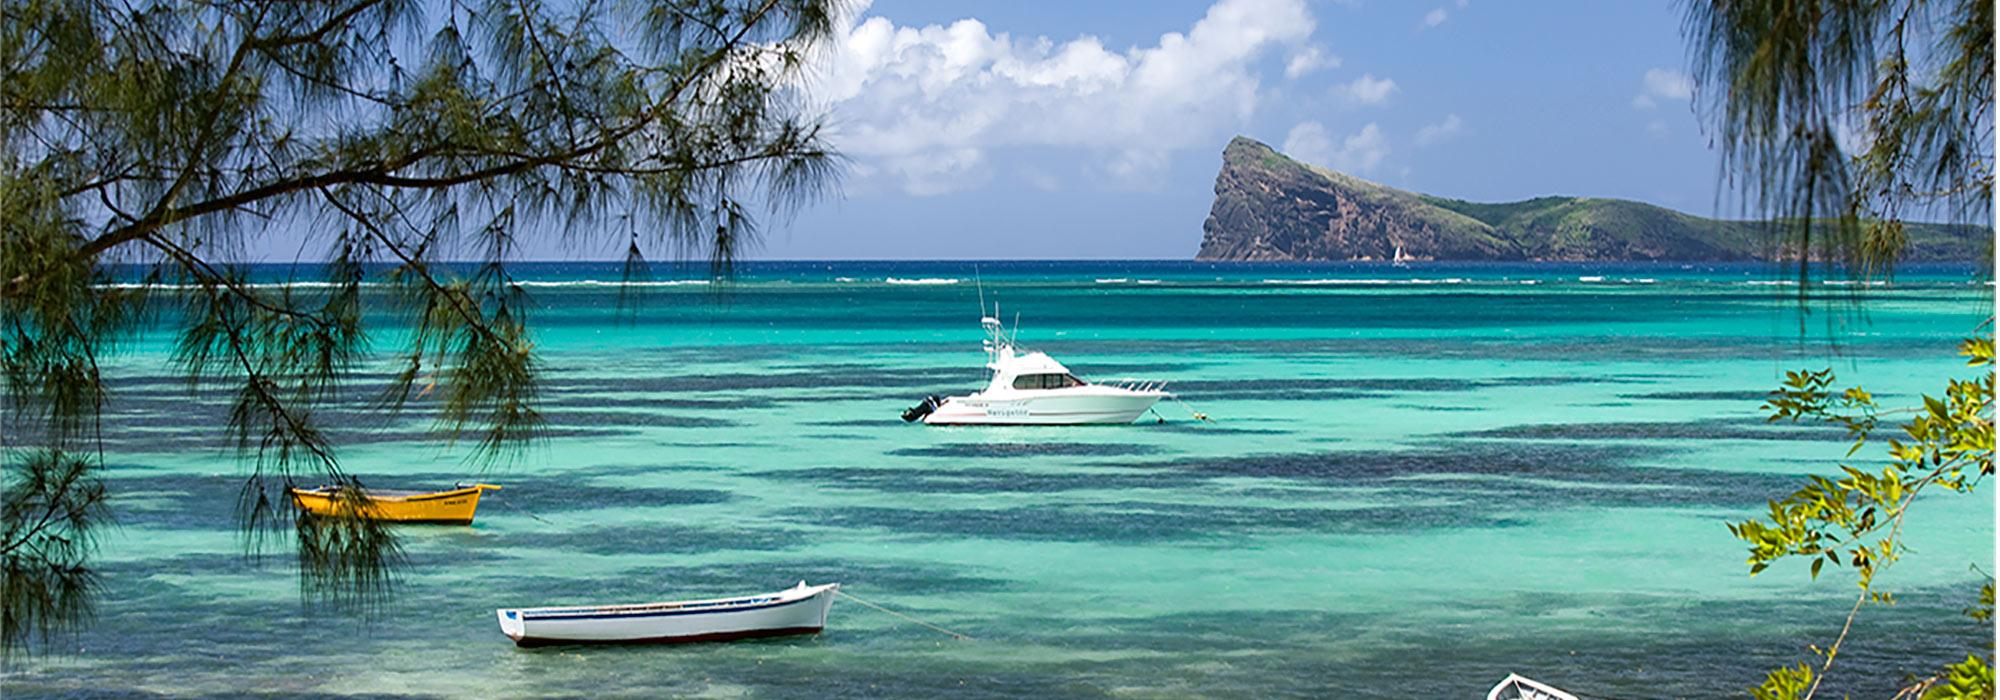 resa till mauritius